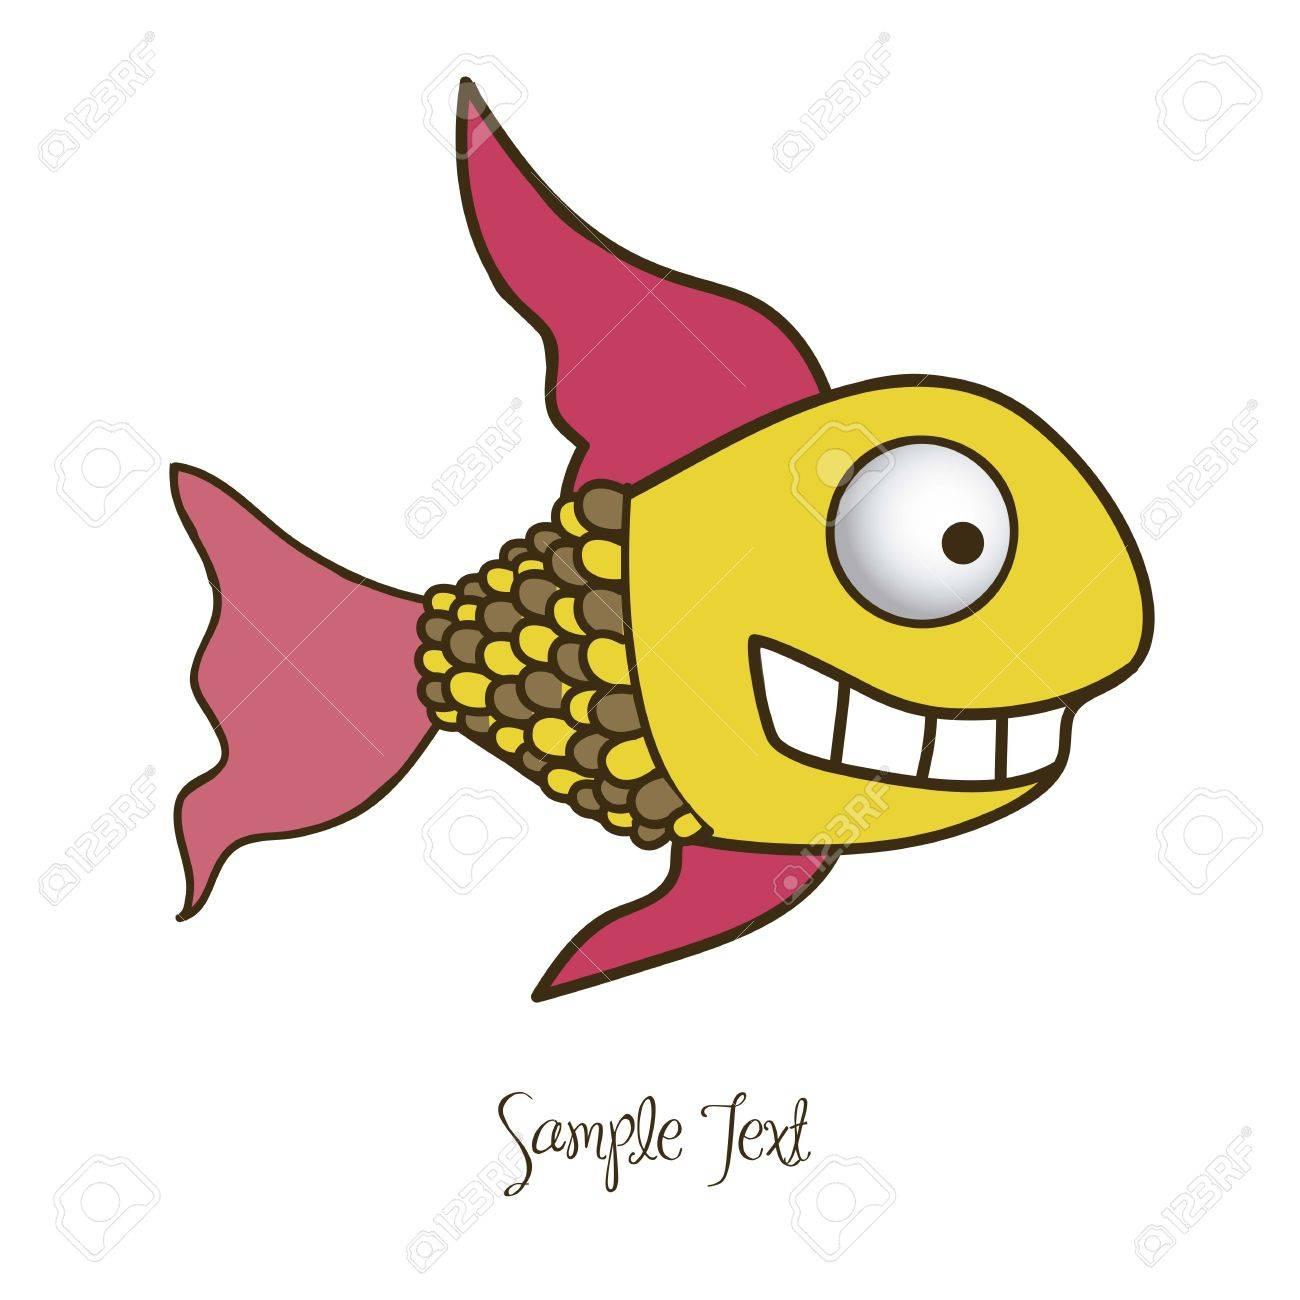 1300x1300 Illustration Of Fish Drawings, Aquatic Animals, Vector